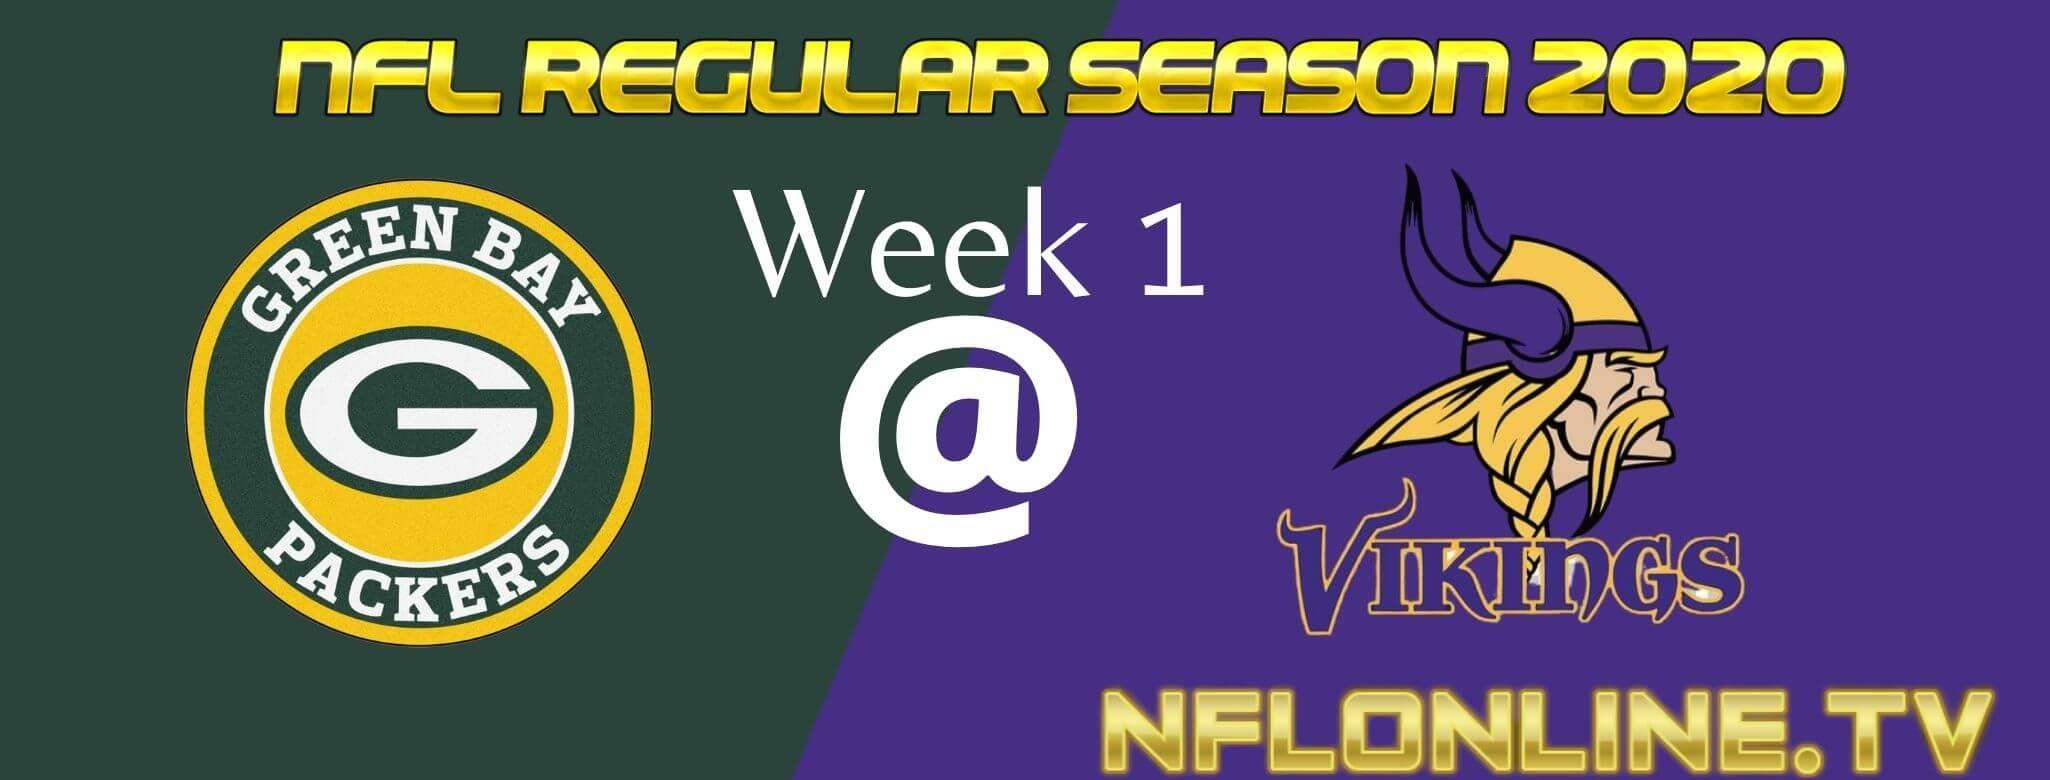 Green Bay Packers Vs Minnesota Vikings Live Stream 2020 Full Game Replay Nfl Week 1 Reg In 2020 Minnesota Vikings Vikings Live Packers